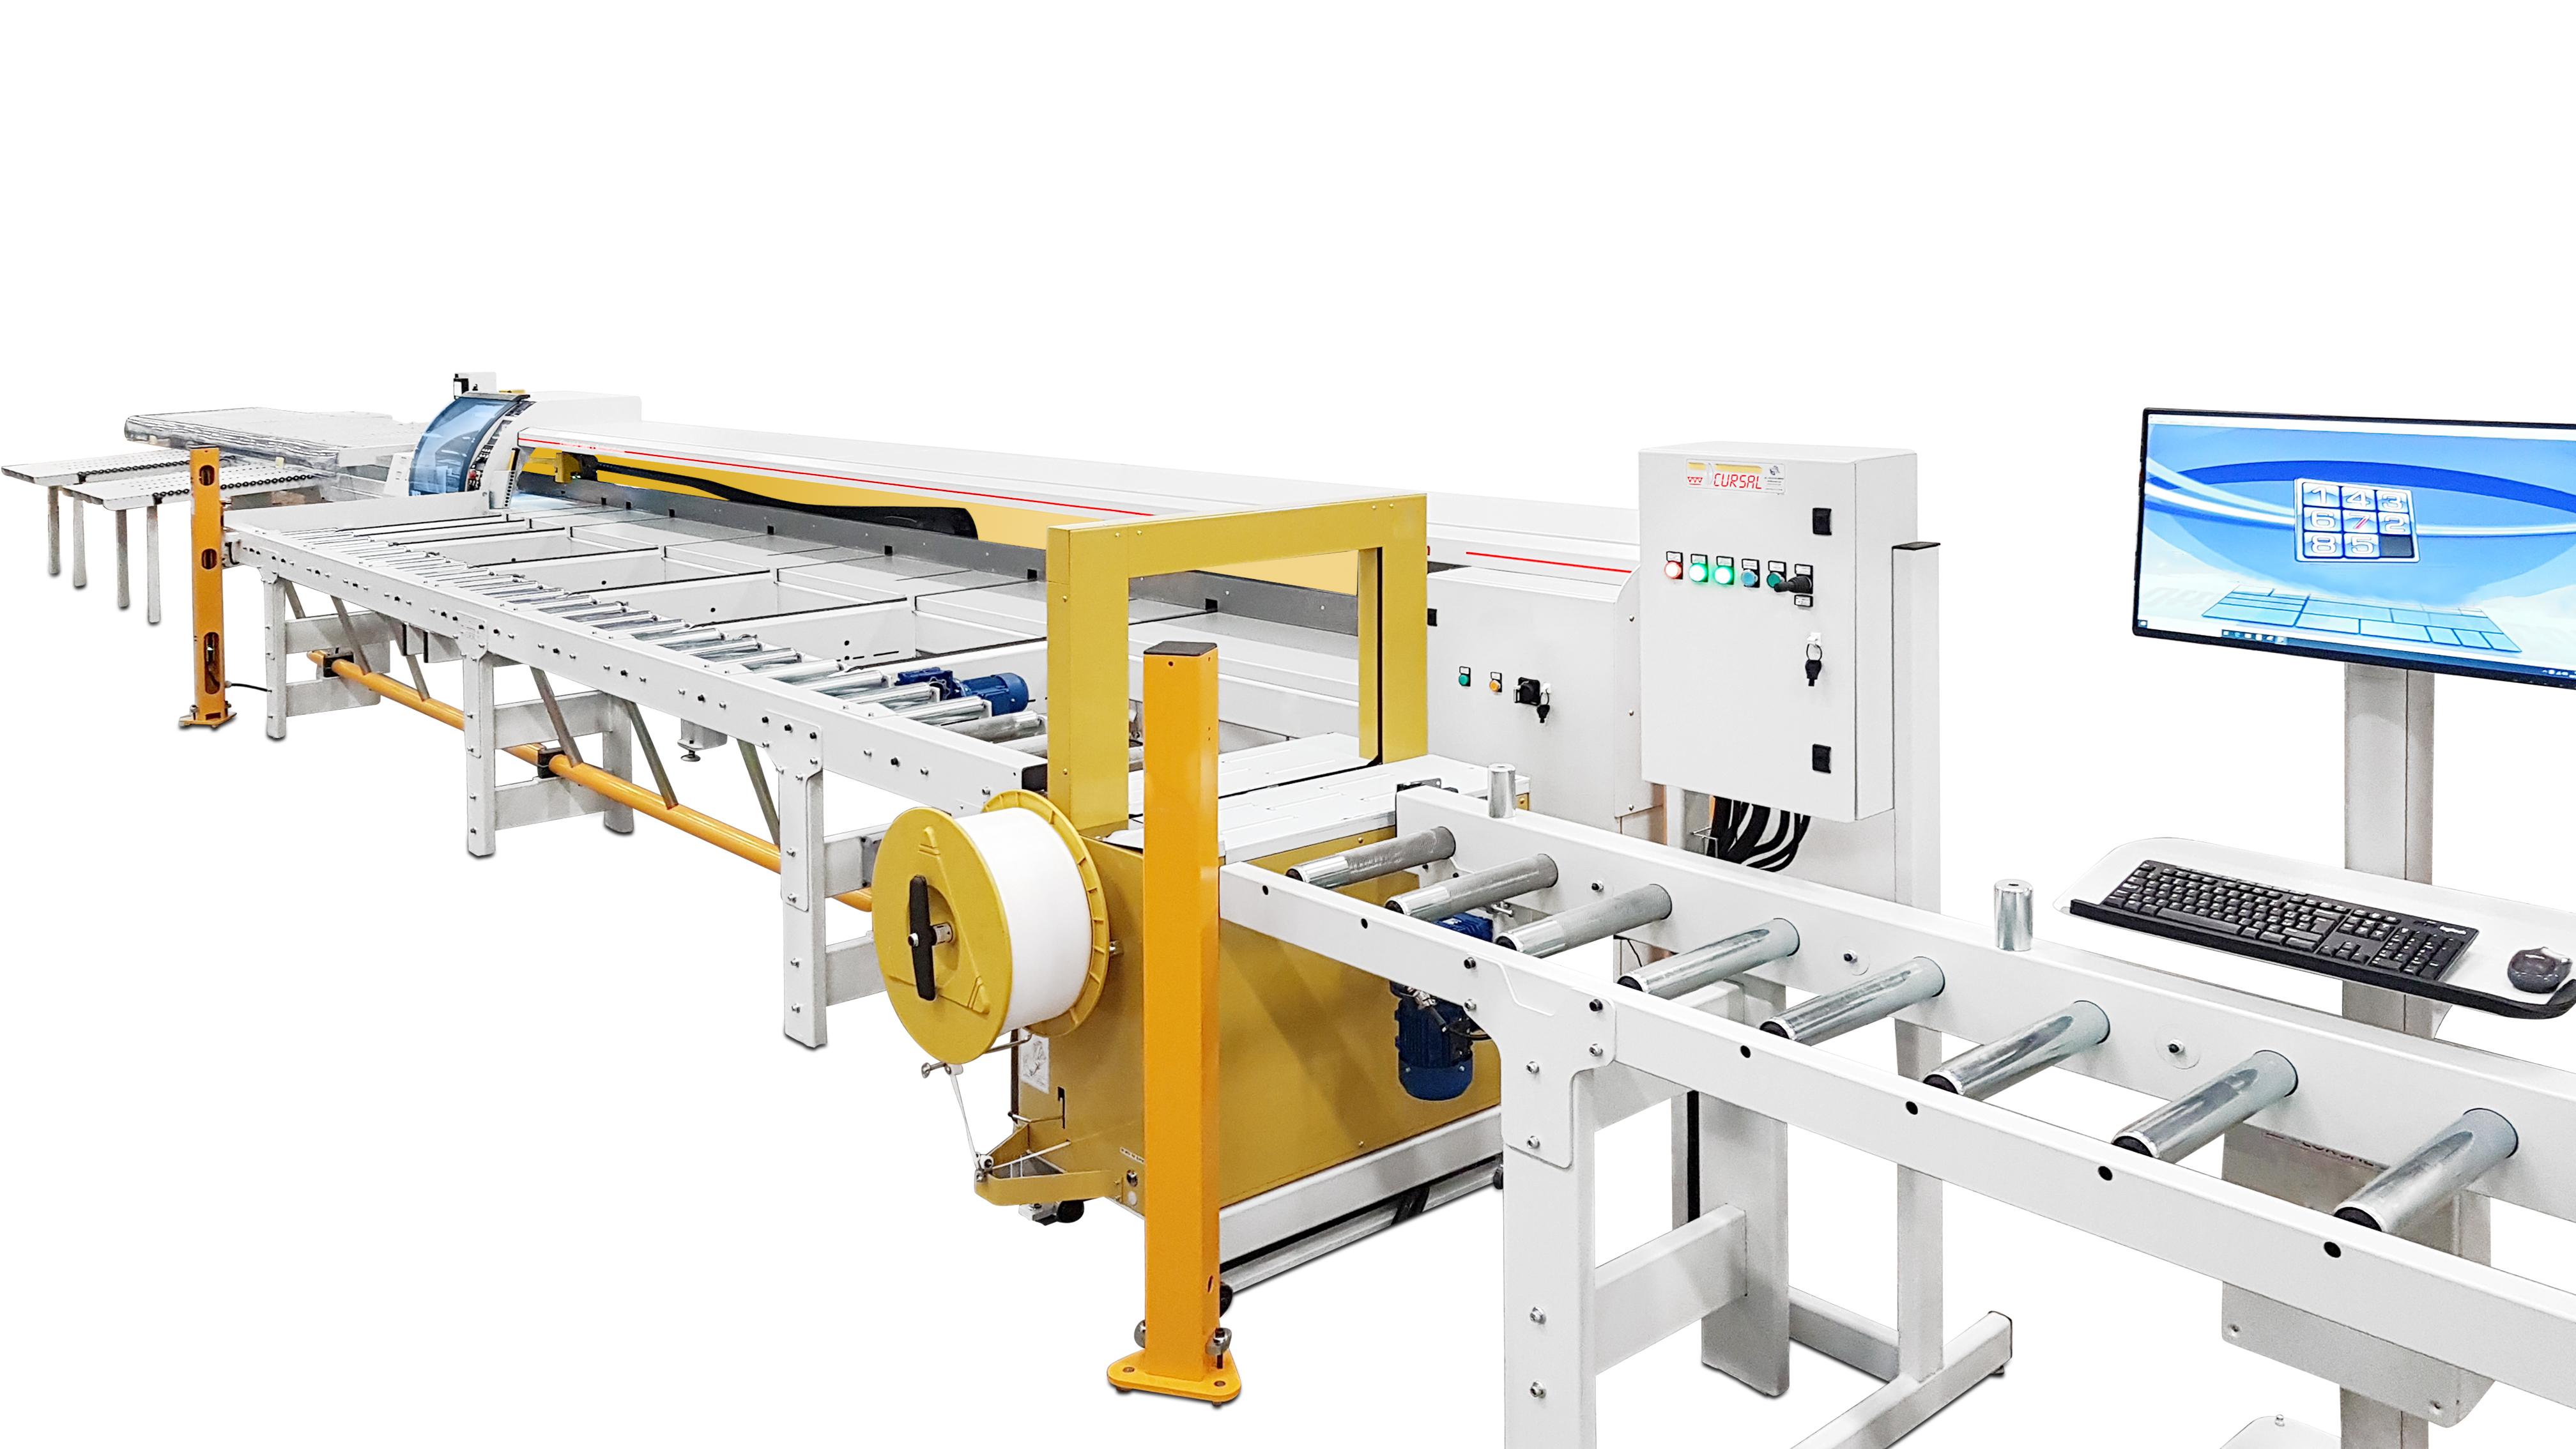 cursal-optimizing-push-feed-saws-trsi-500-24